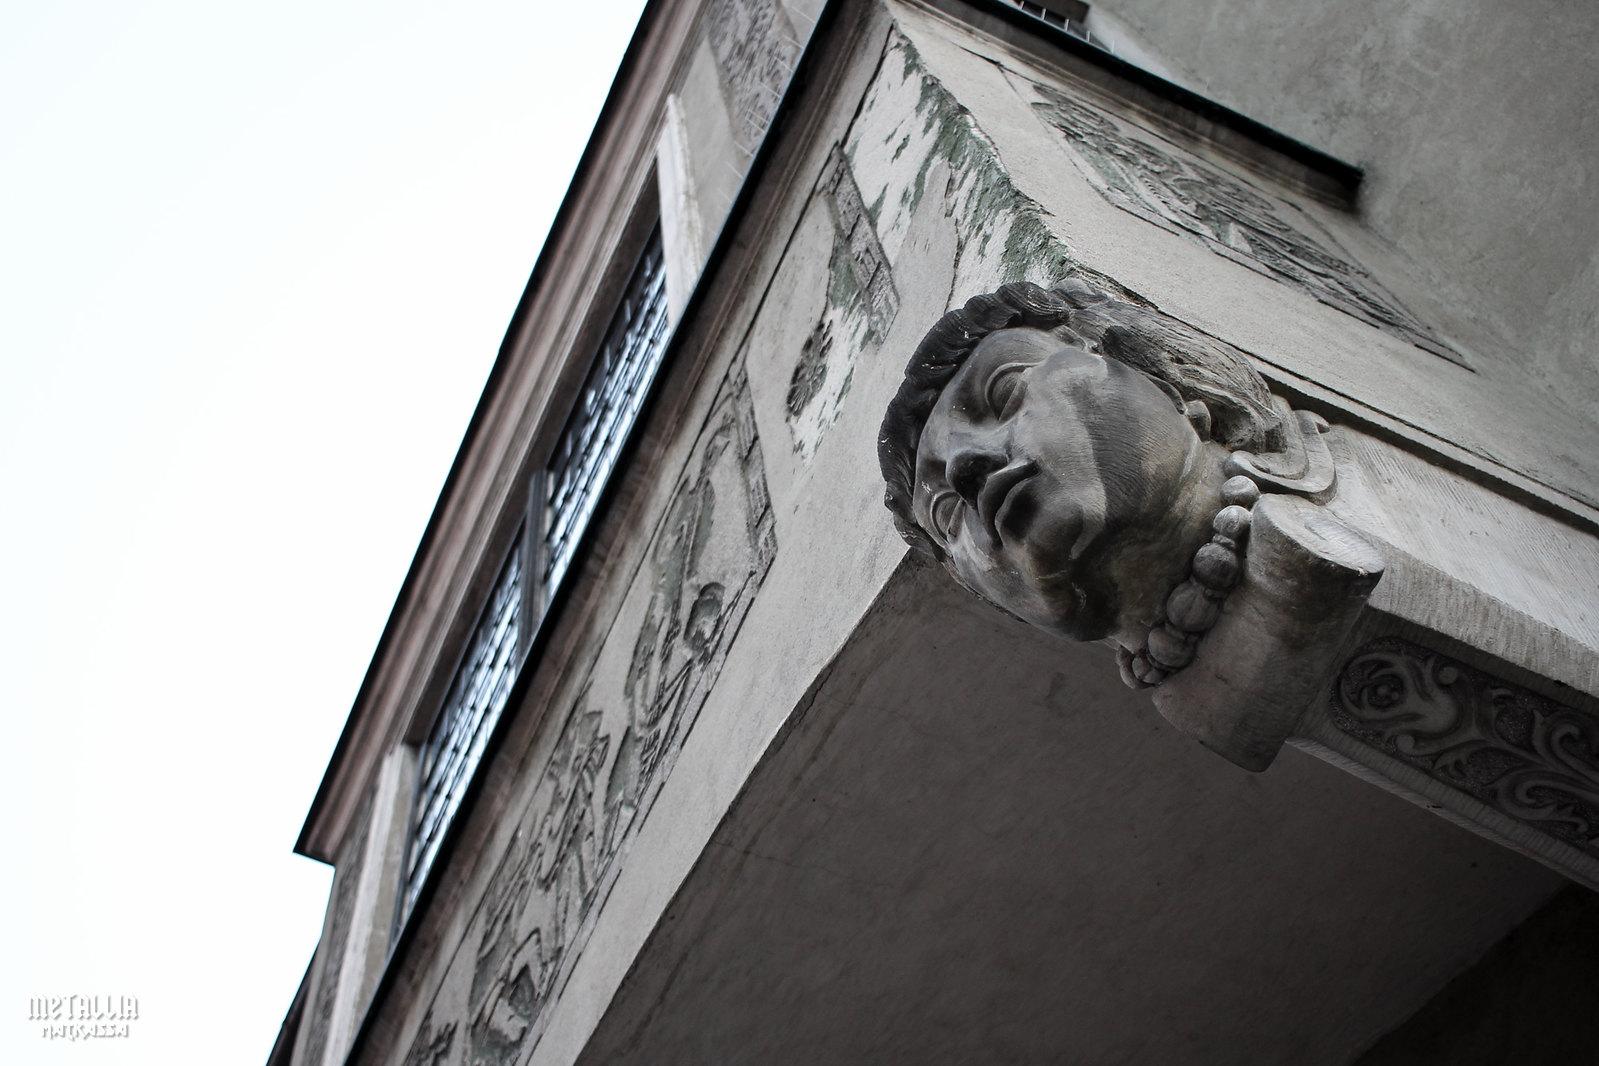 poznan, visit poznan, old town poznan, poznanin vanhakaupunki, stare miasto